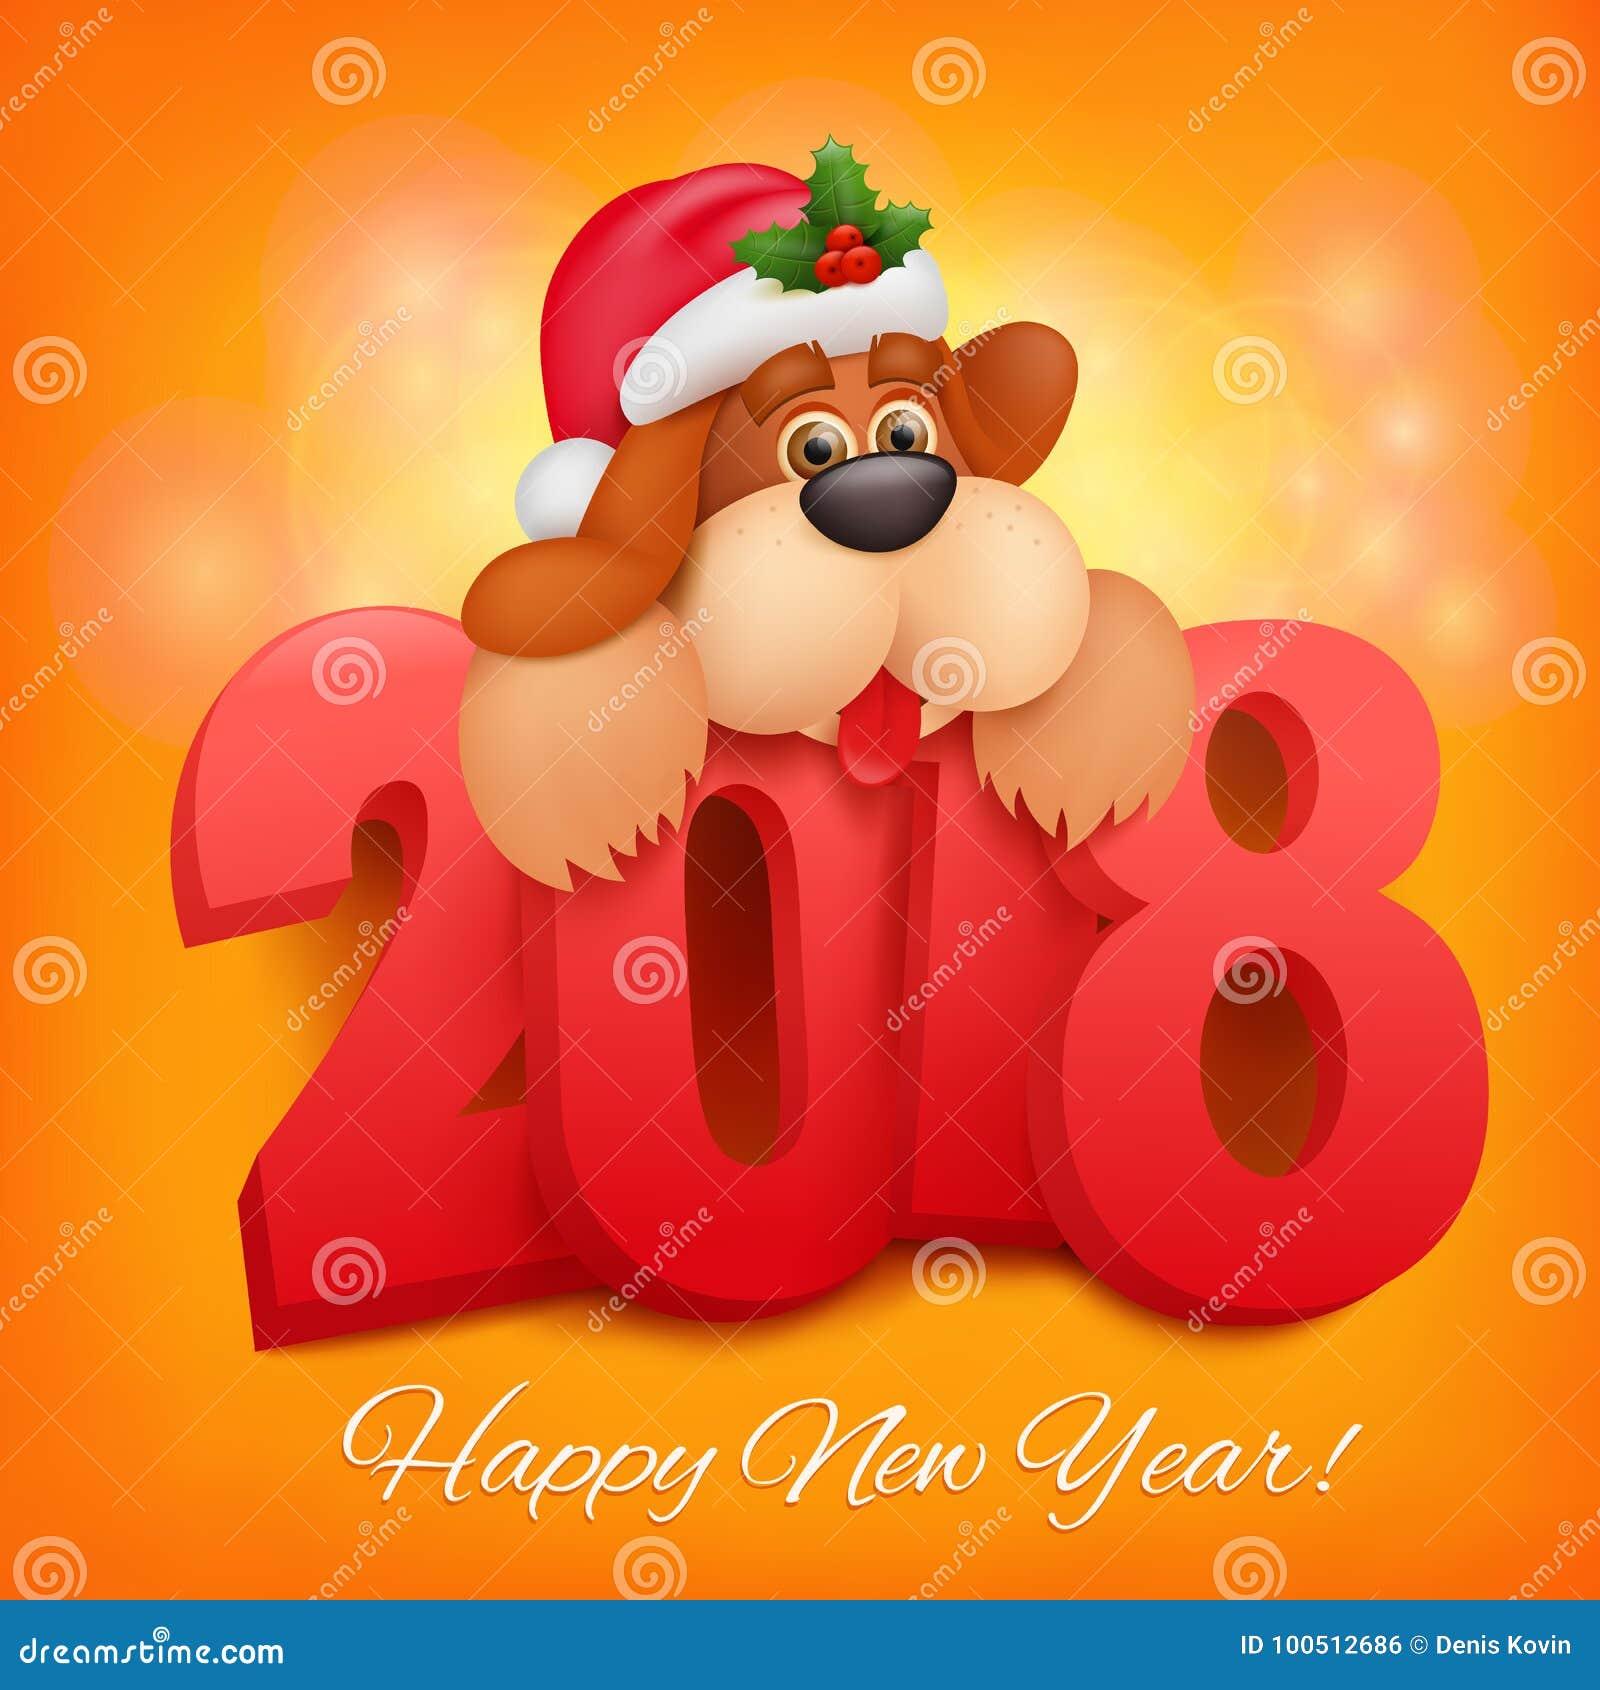 2018 happy new year greeting card celebration background with funny 2018 happy new year greeting card celebration background with funny dog character m4hsunfo